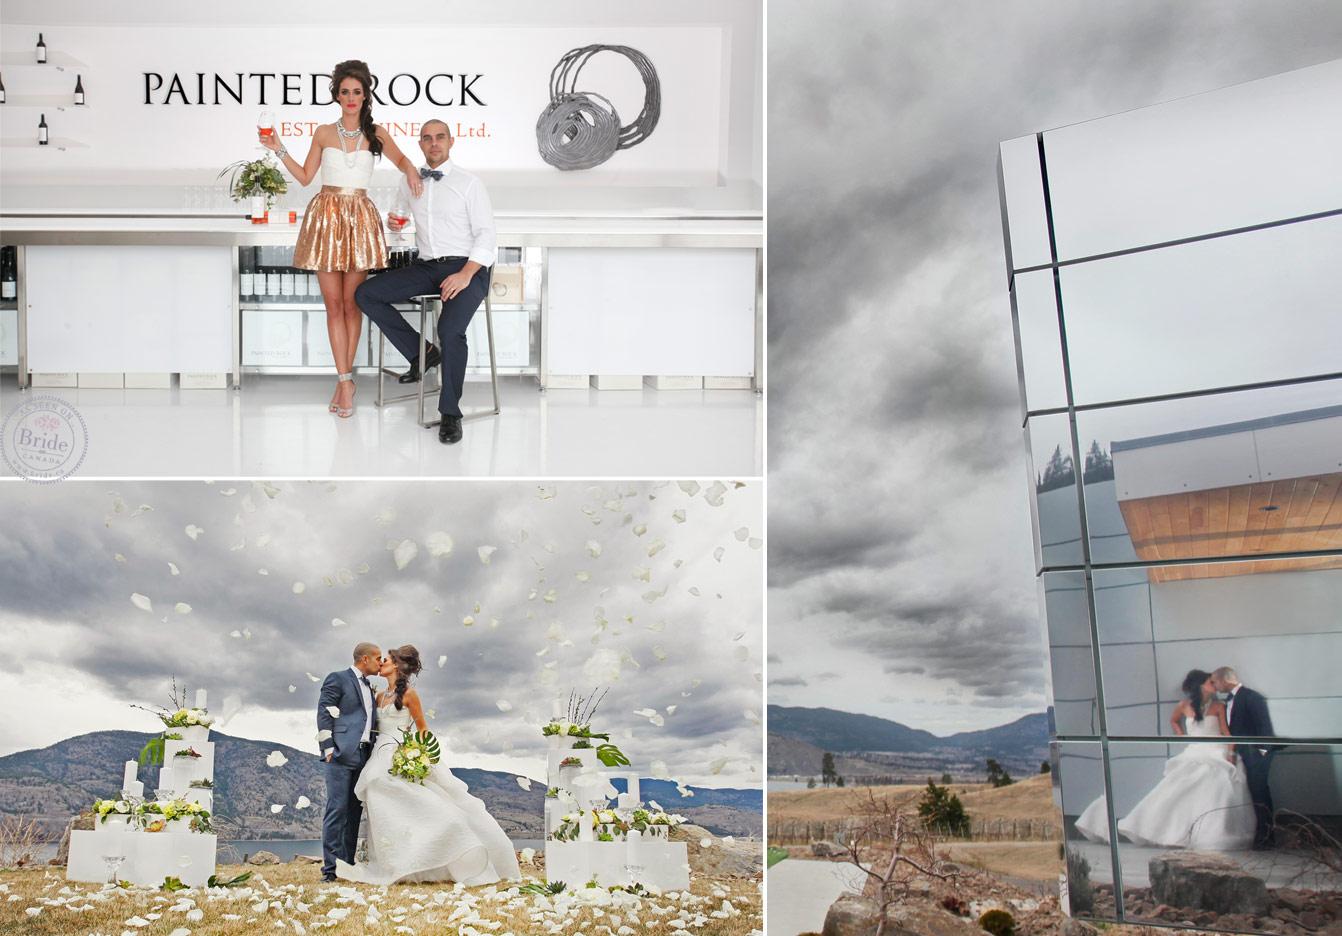 Brideca Painted Rock Winery A Modern Okanagan Wedding